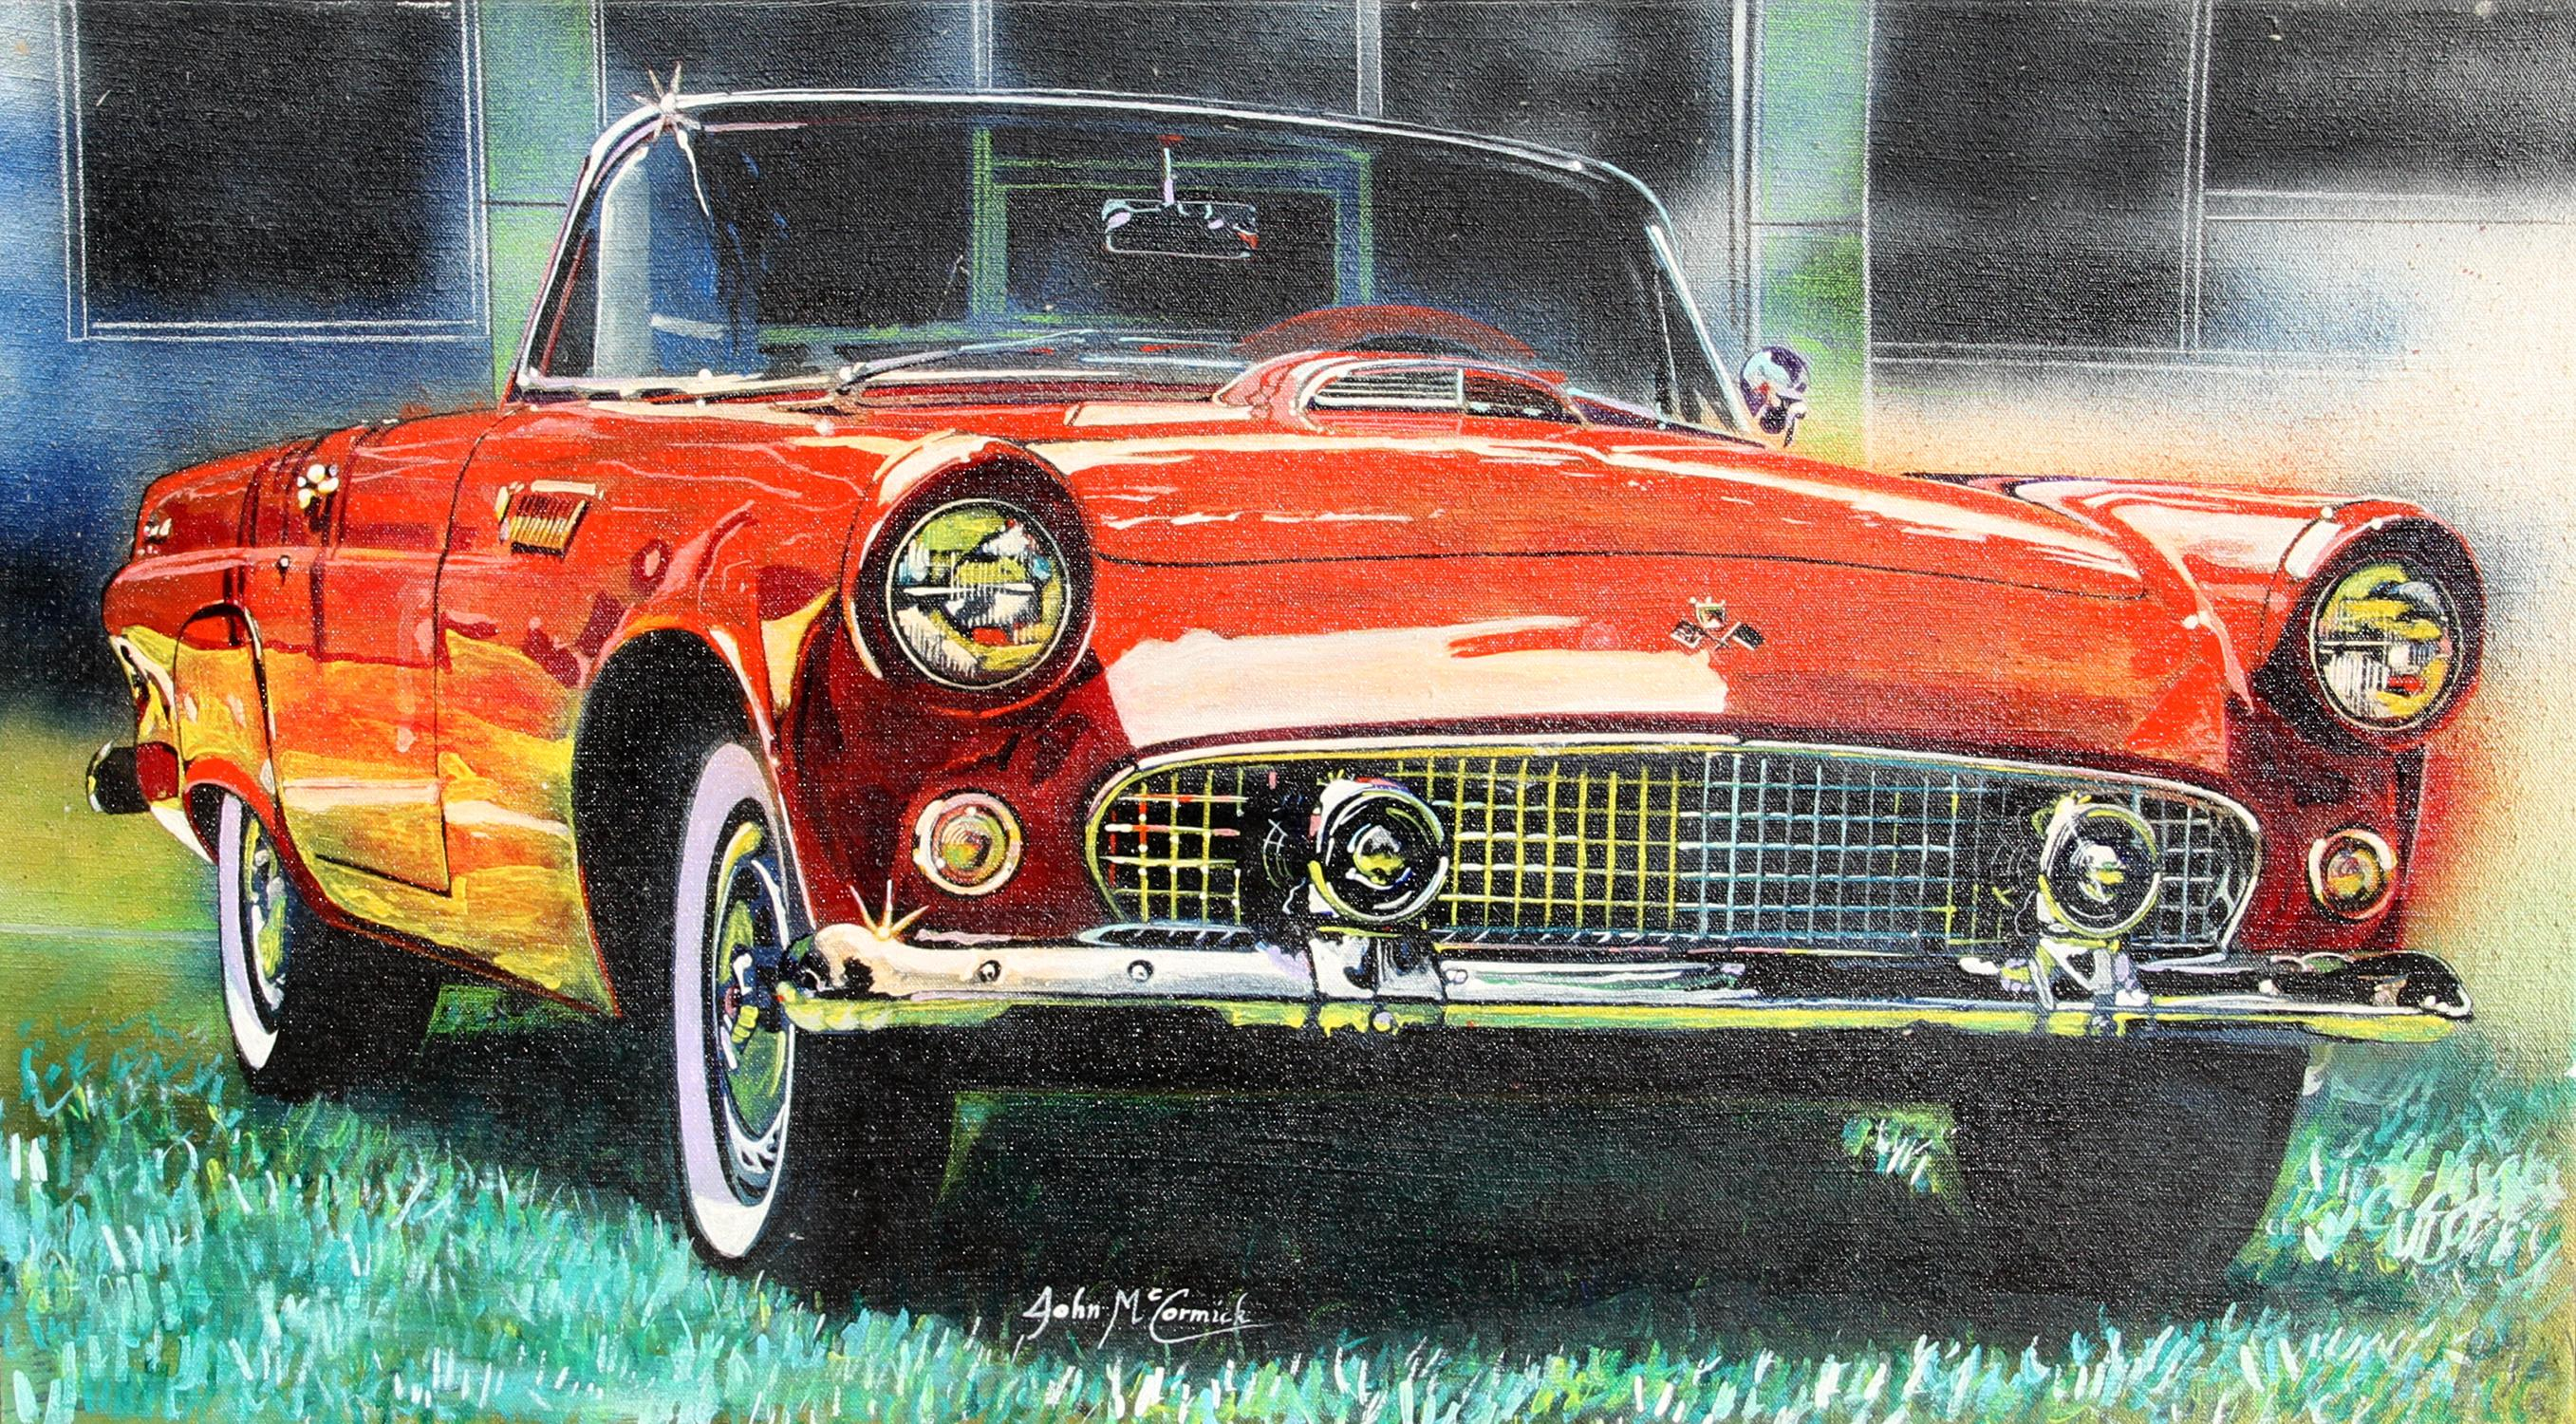 1956 Ford Thunderbird, Oil Painting by John McCormick